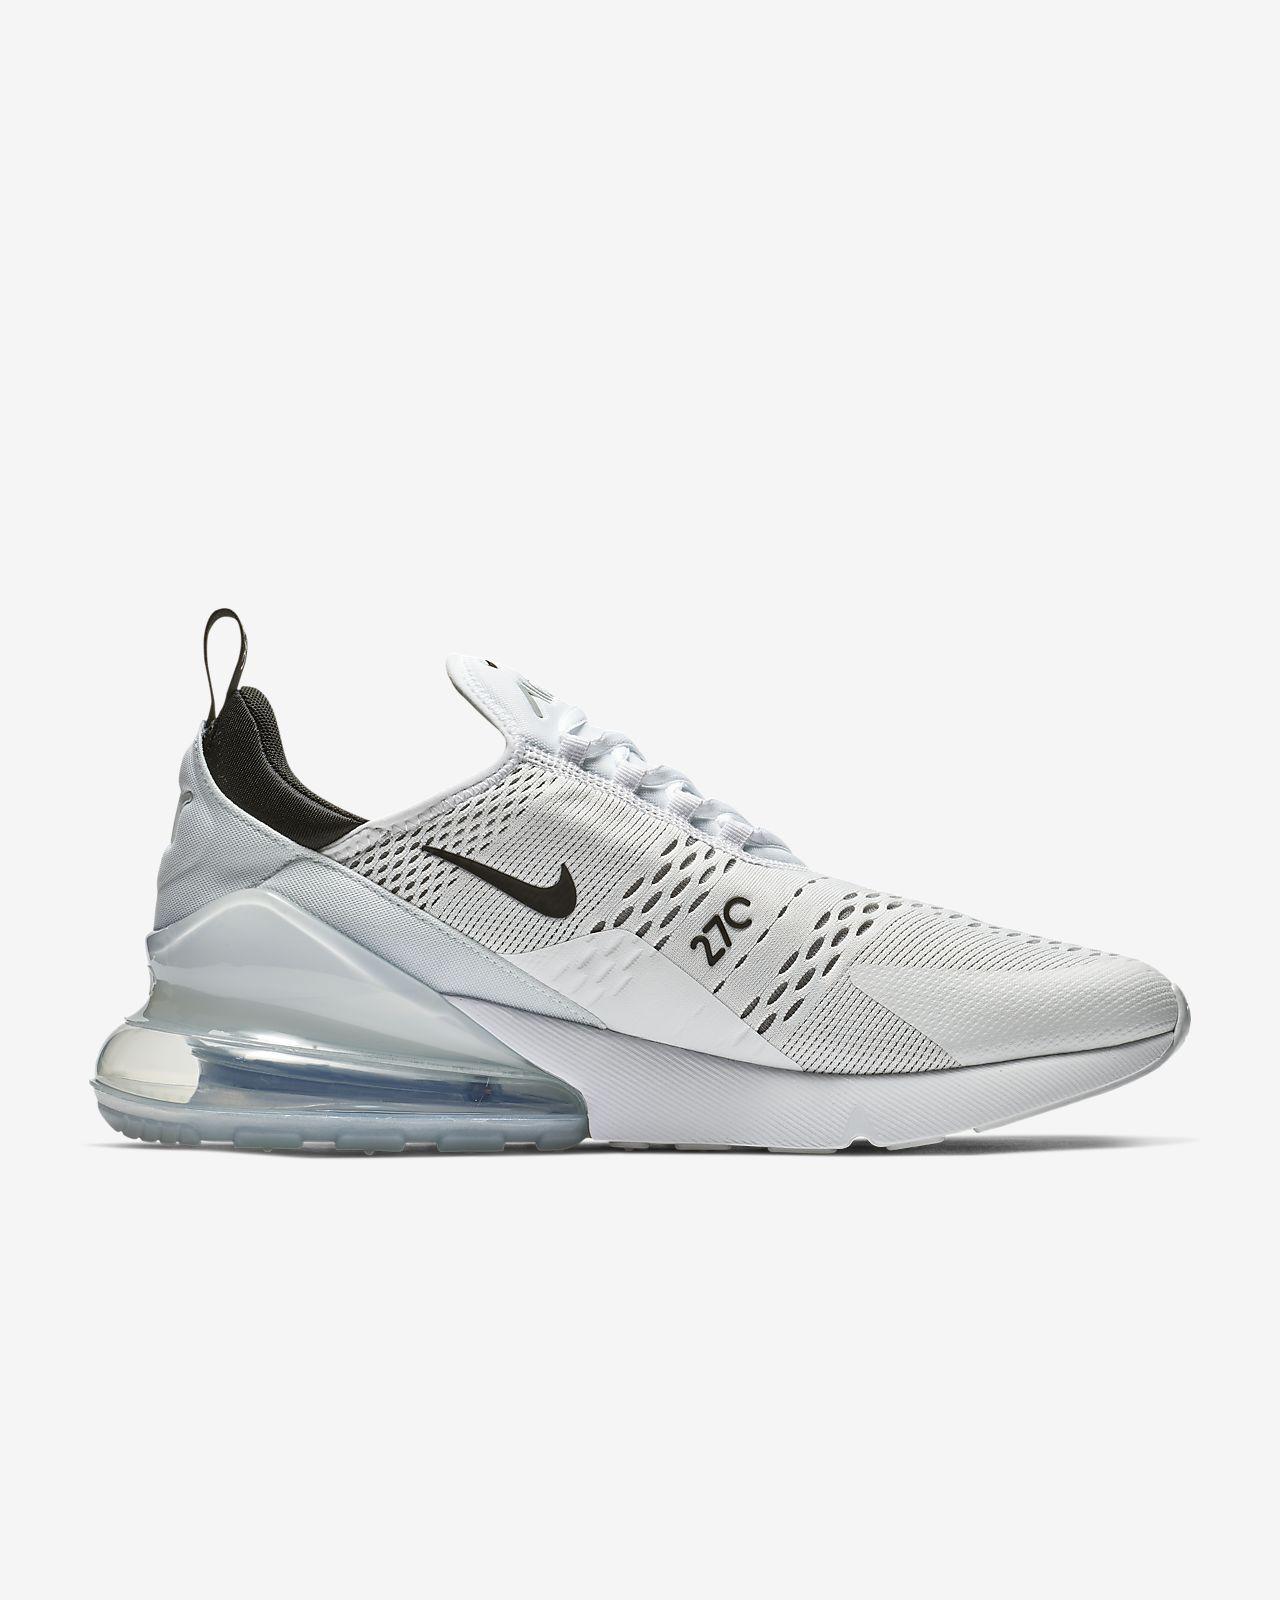 Acquista Nike Air Max Vapormax 270 Nuovi Arrivi Sneakers